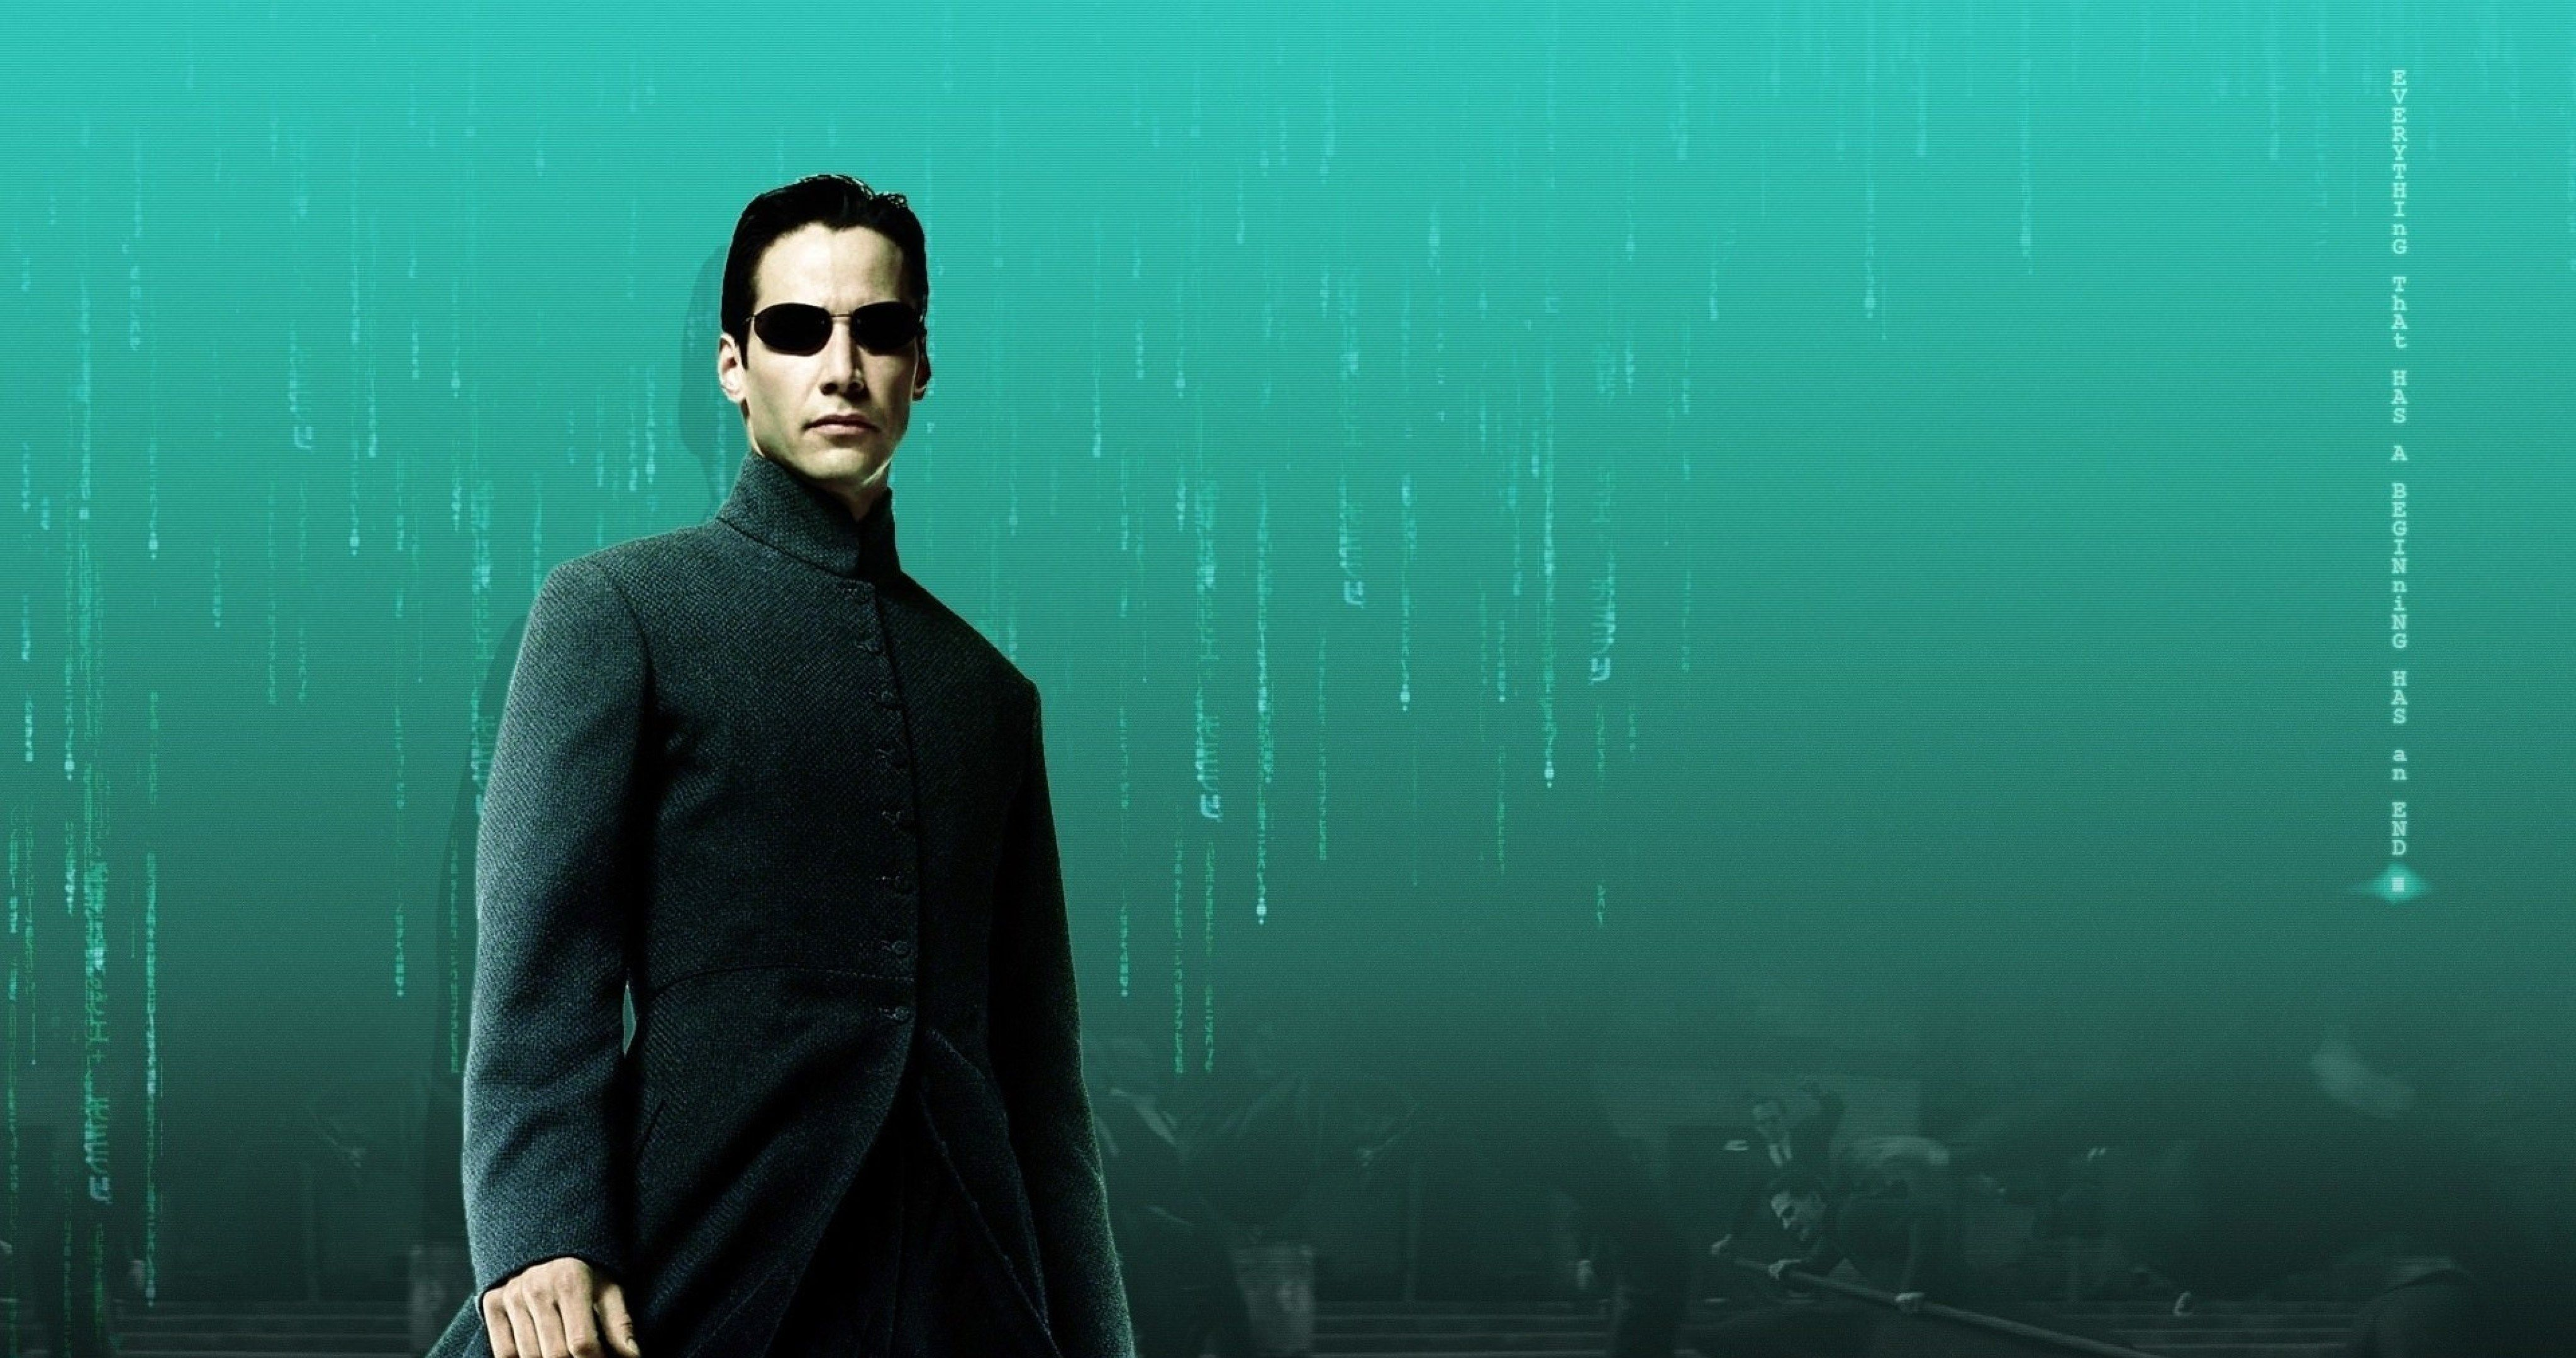 Free download the matrix neo 4k ultra hd wallpaper ...